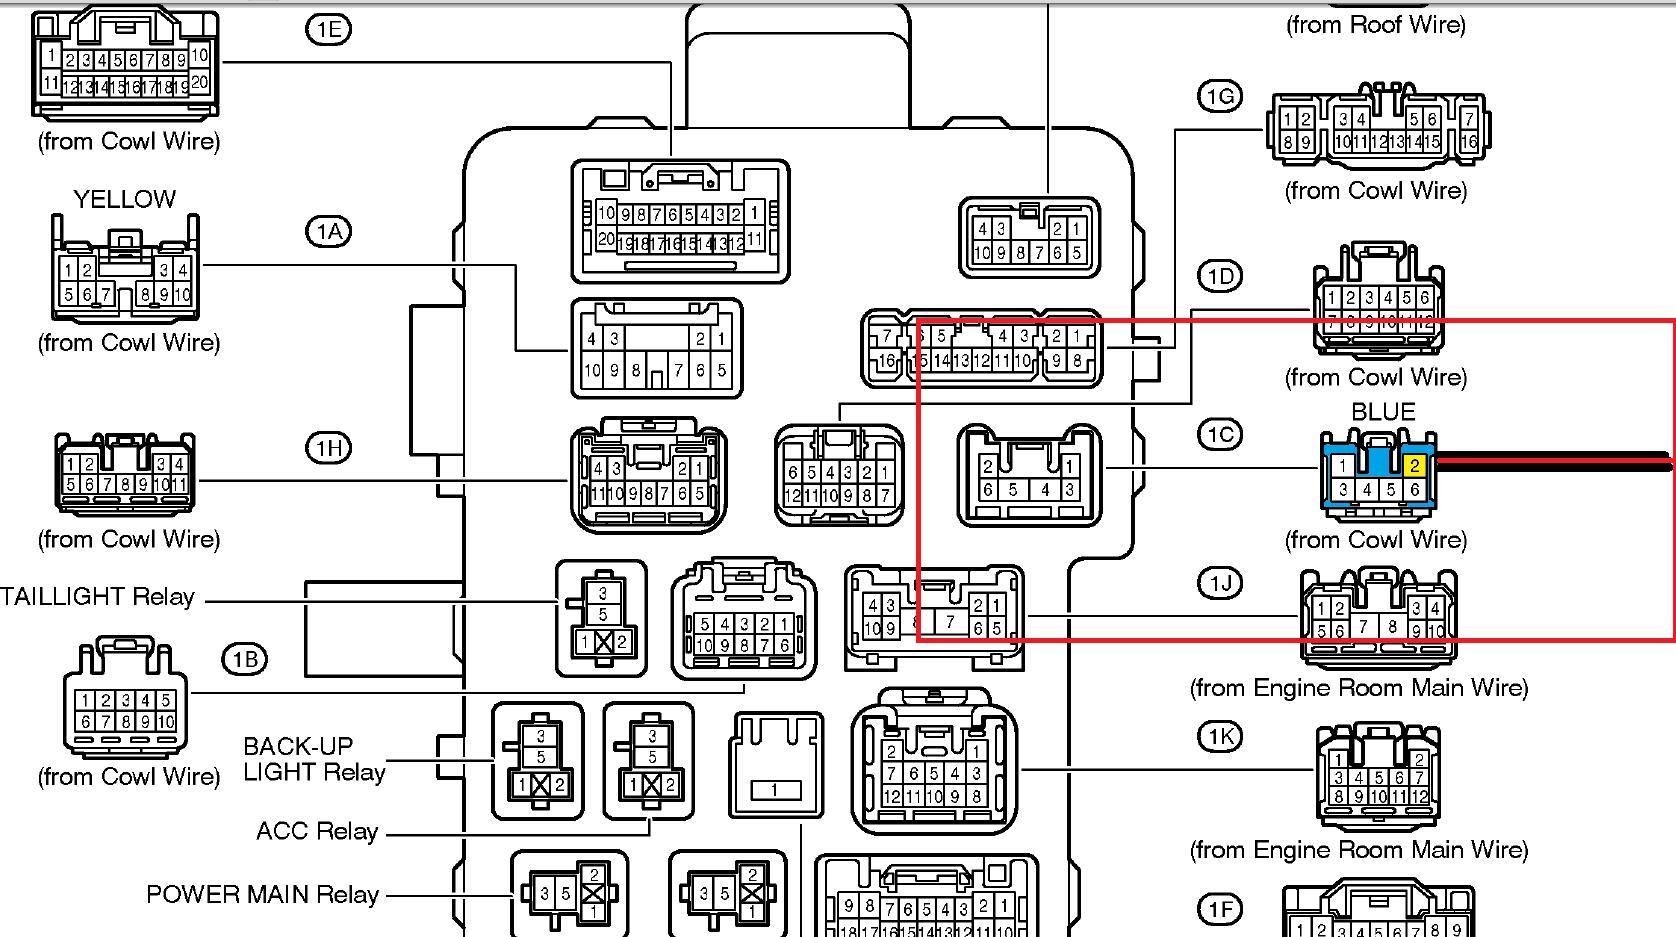 Peachy 2001 Corolla Fuse Box Wiring Diagram Wiring Database Gentotyuccorg